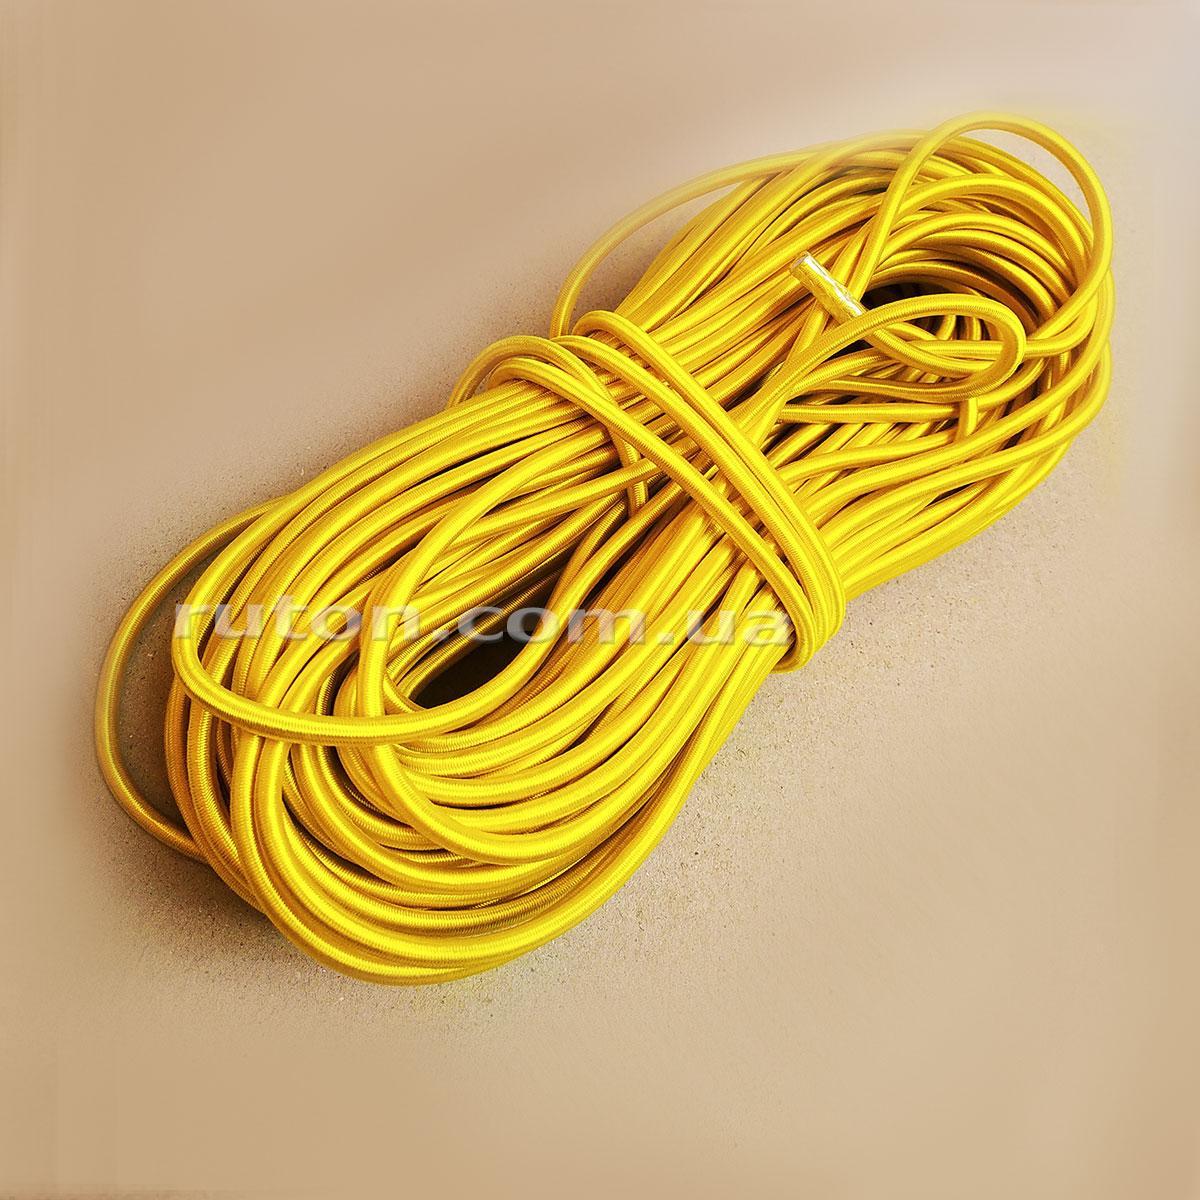 6 мм 50 м Эластичний резиновий шнур еспандер жовтий для спорта